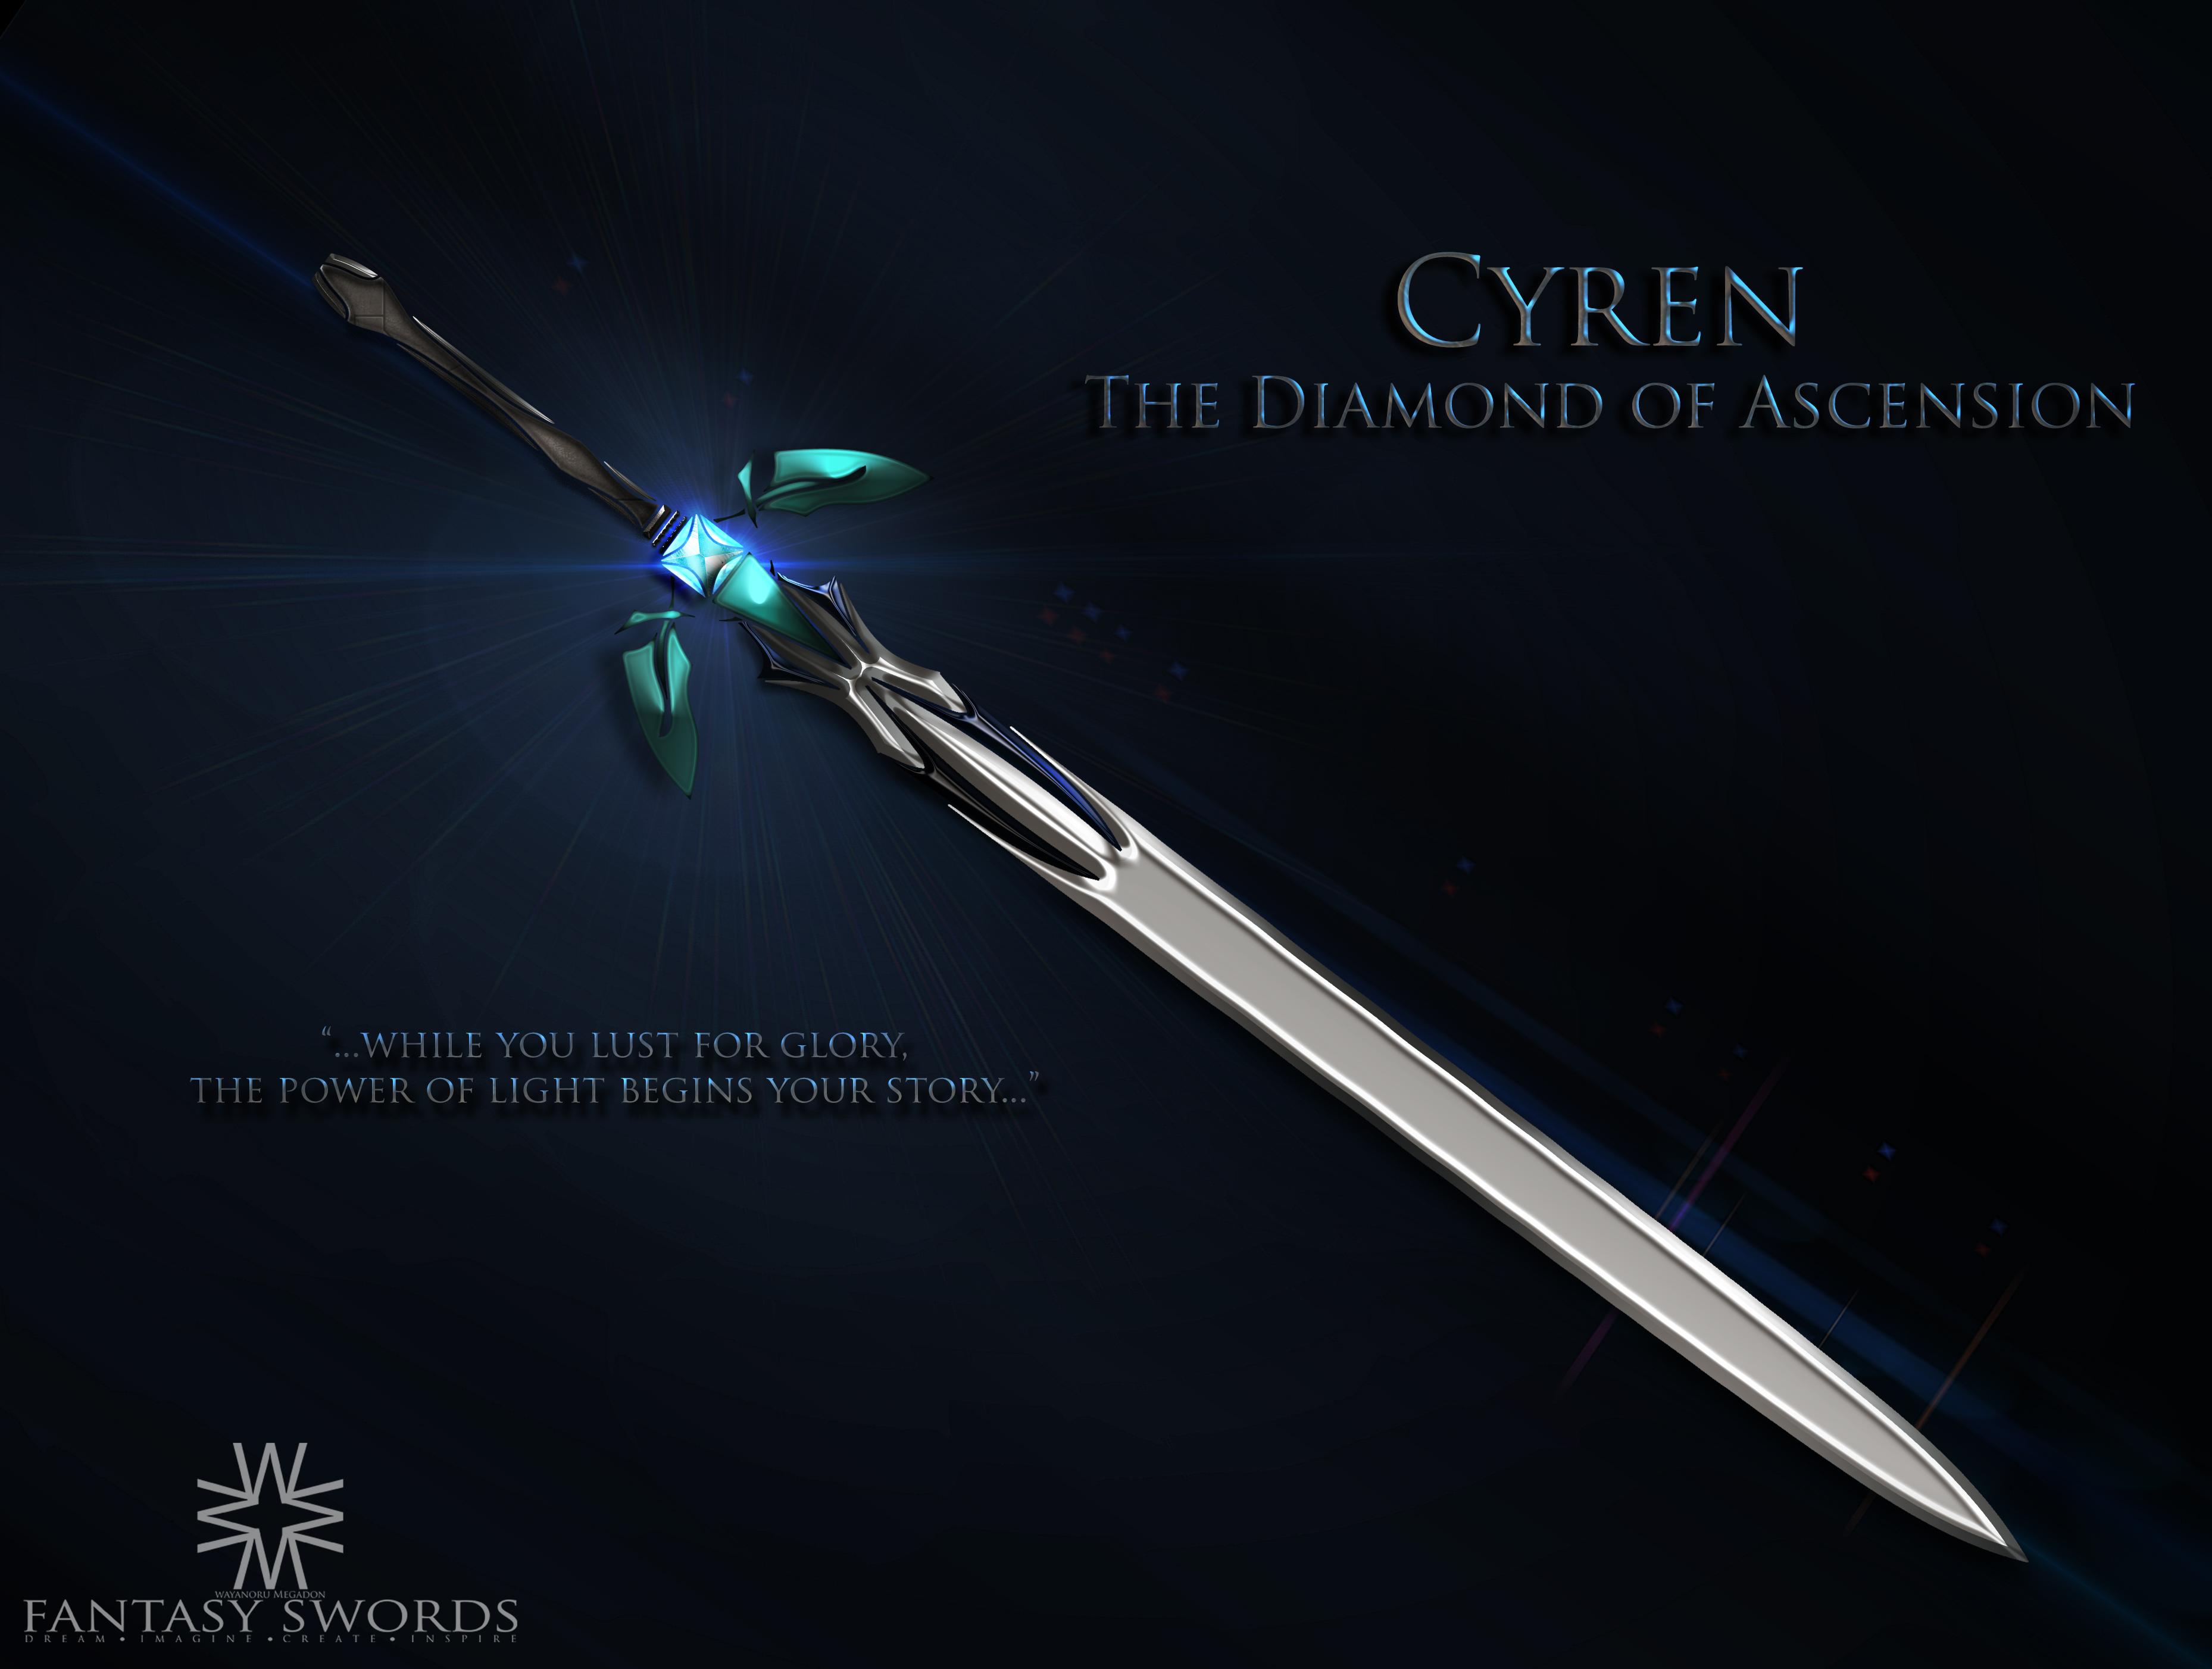 cyren the diamond of ascension by wayanoru on deviantart